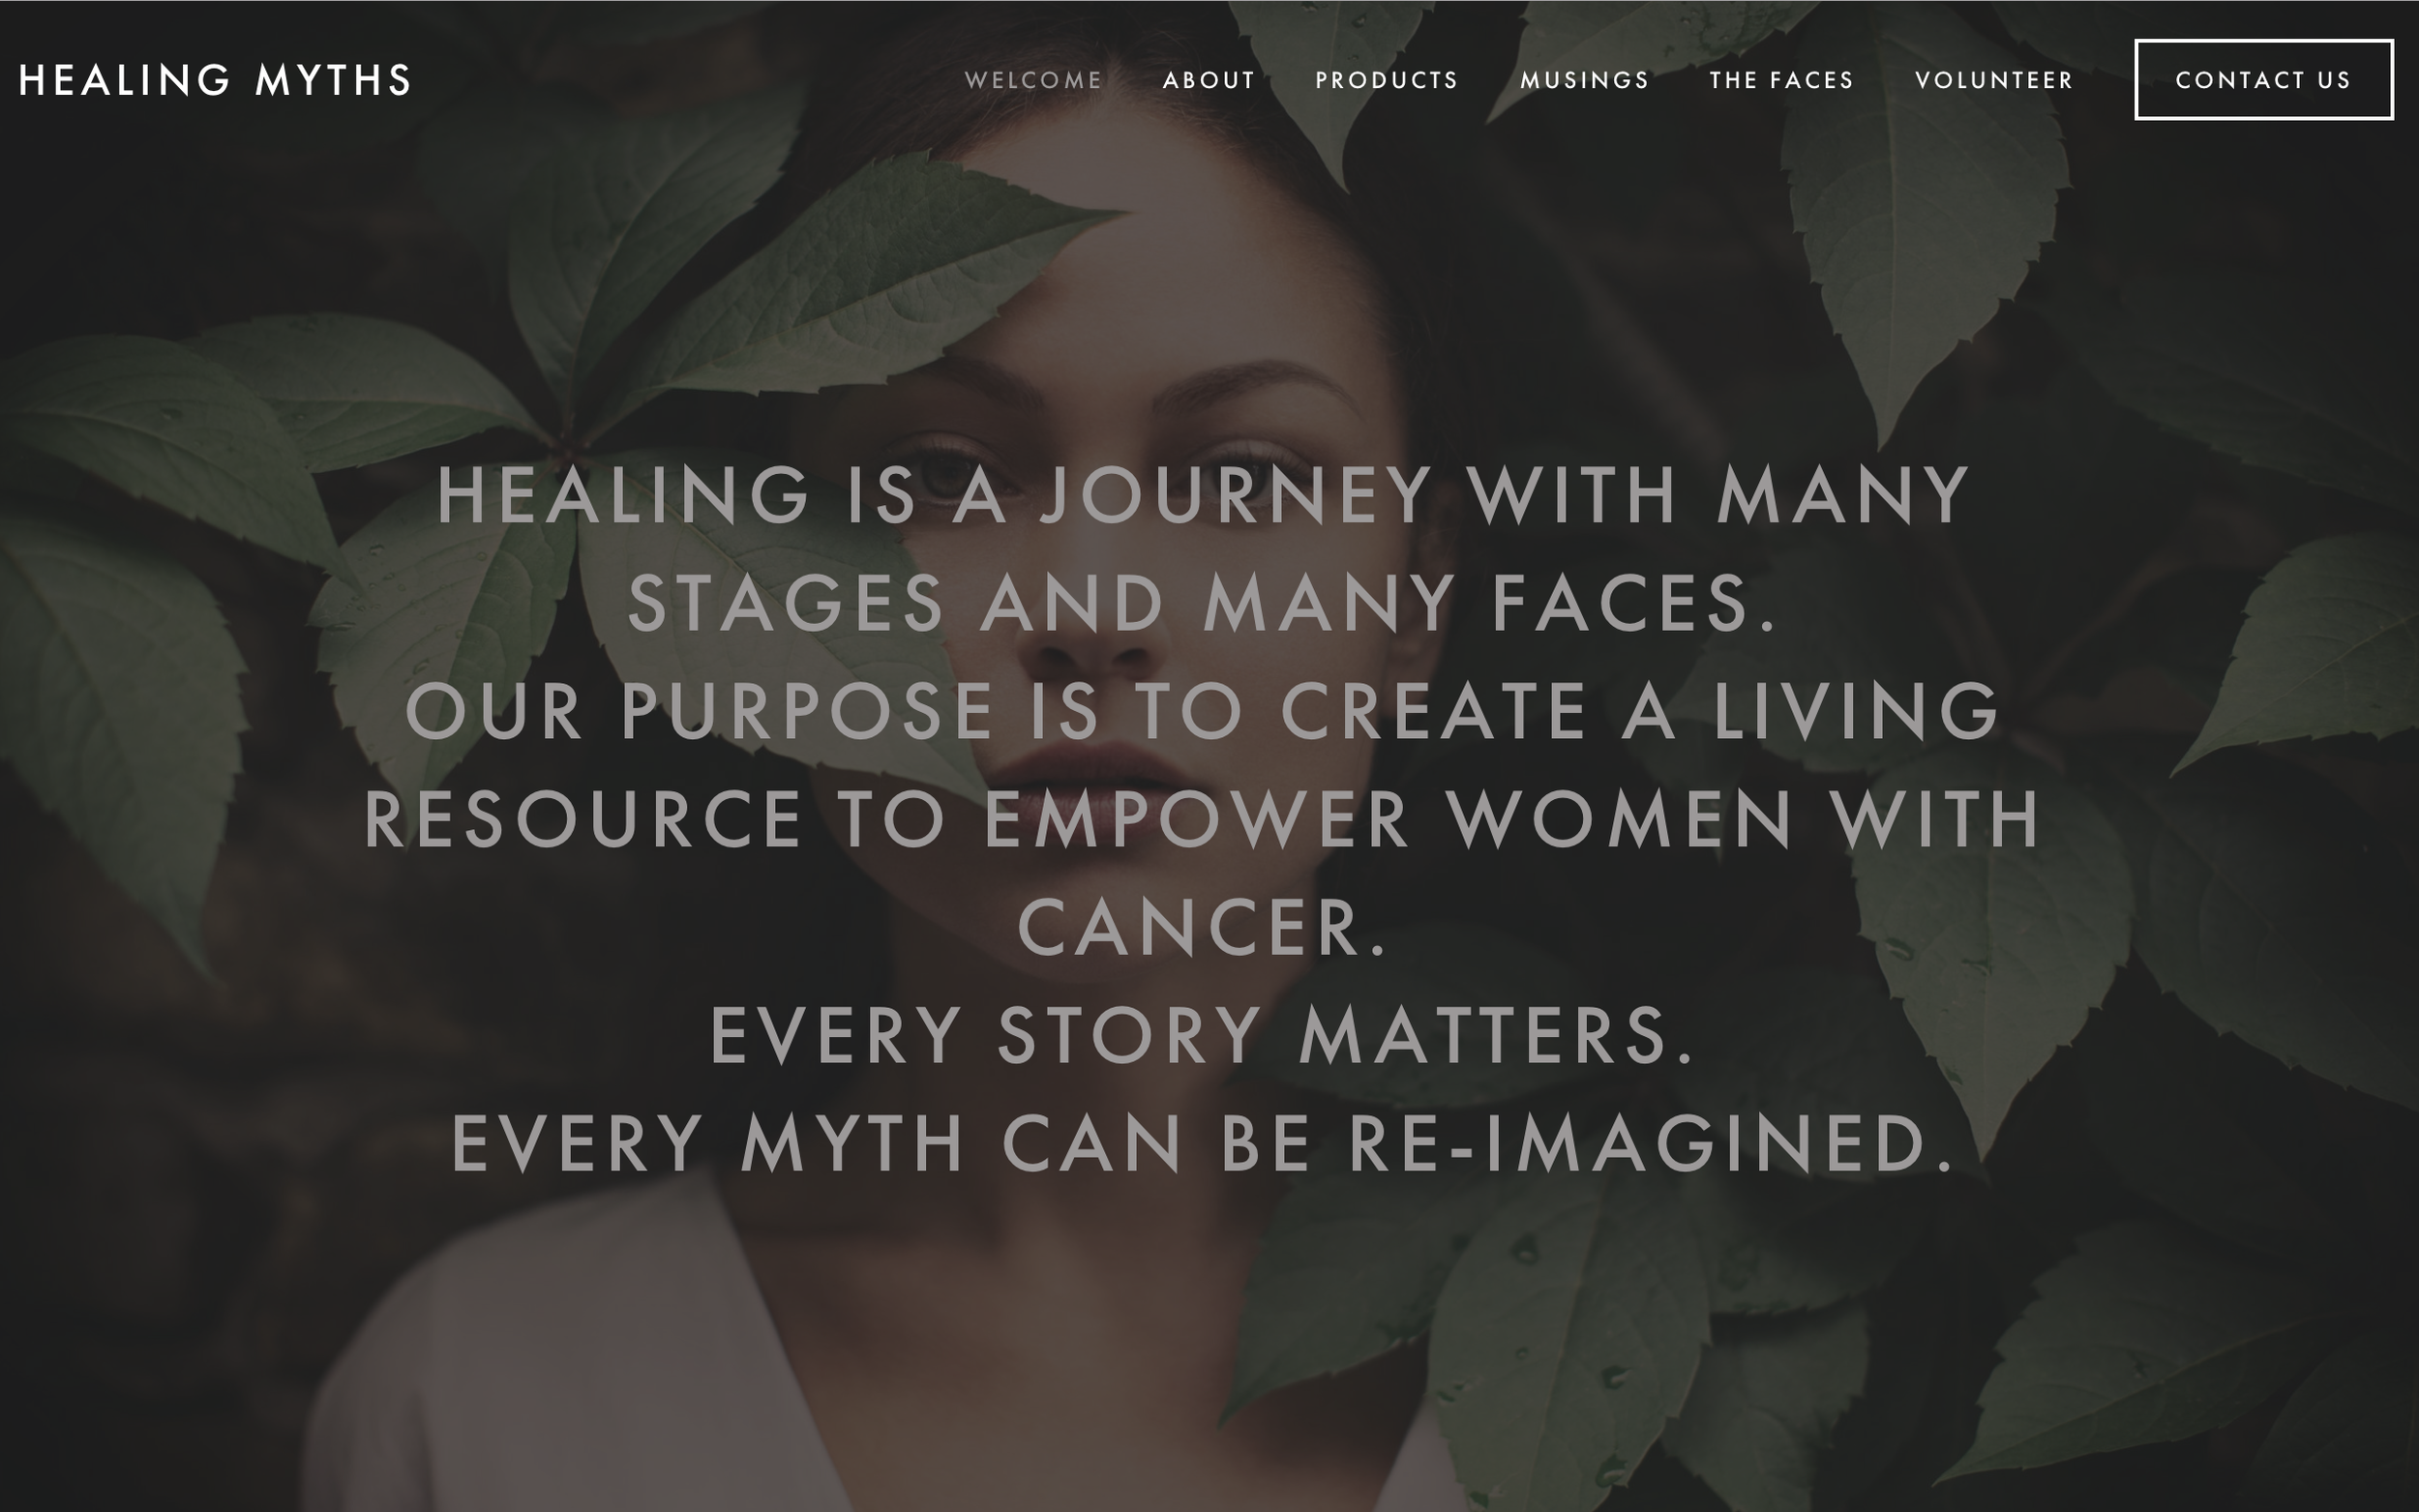 healingmythshome.png